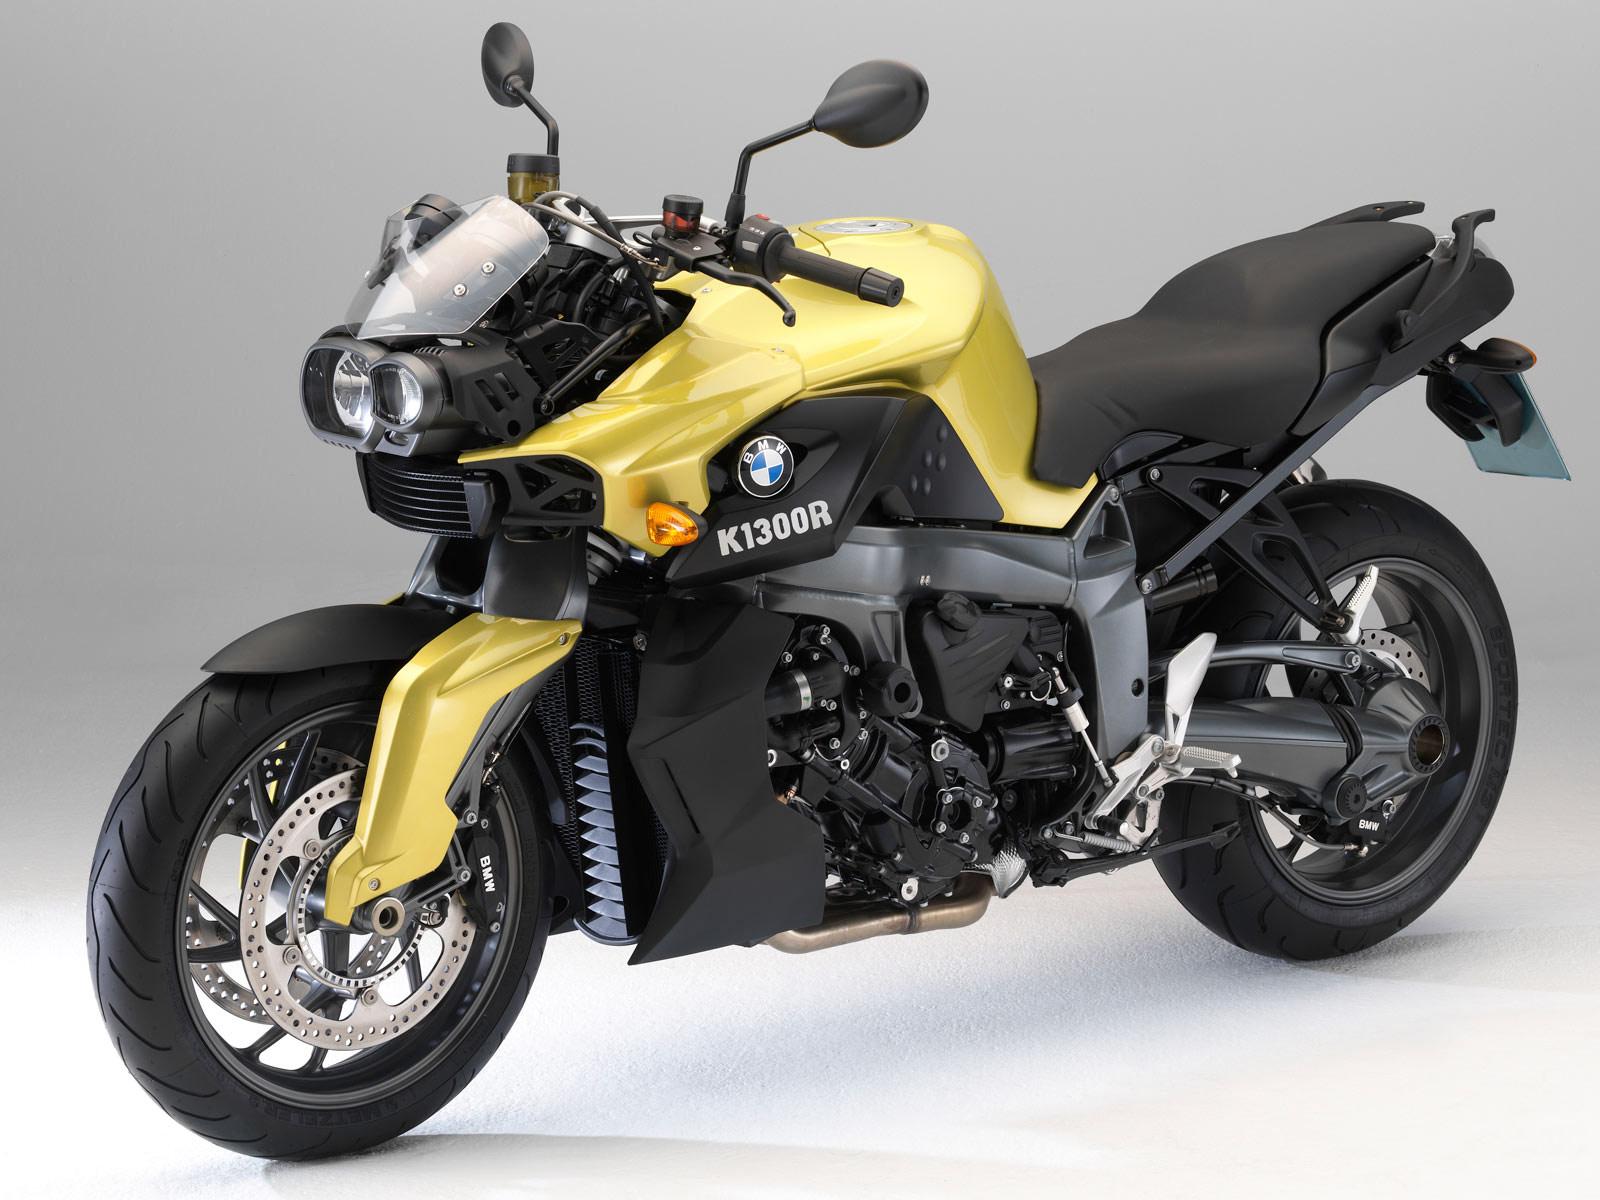 http://3.bp.blogspot.com/-kWTqvLXETPM/TztgonsxpGI/AAAAAAAALjg/HlZry7z4bbw/s1600/BMW+1300r+6.jpg